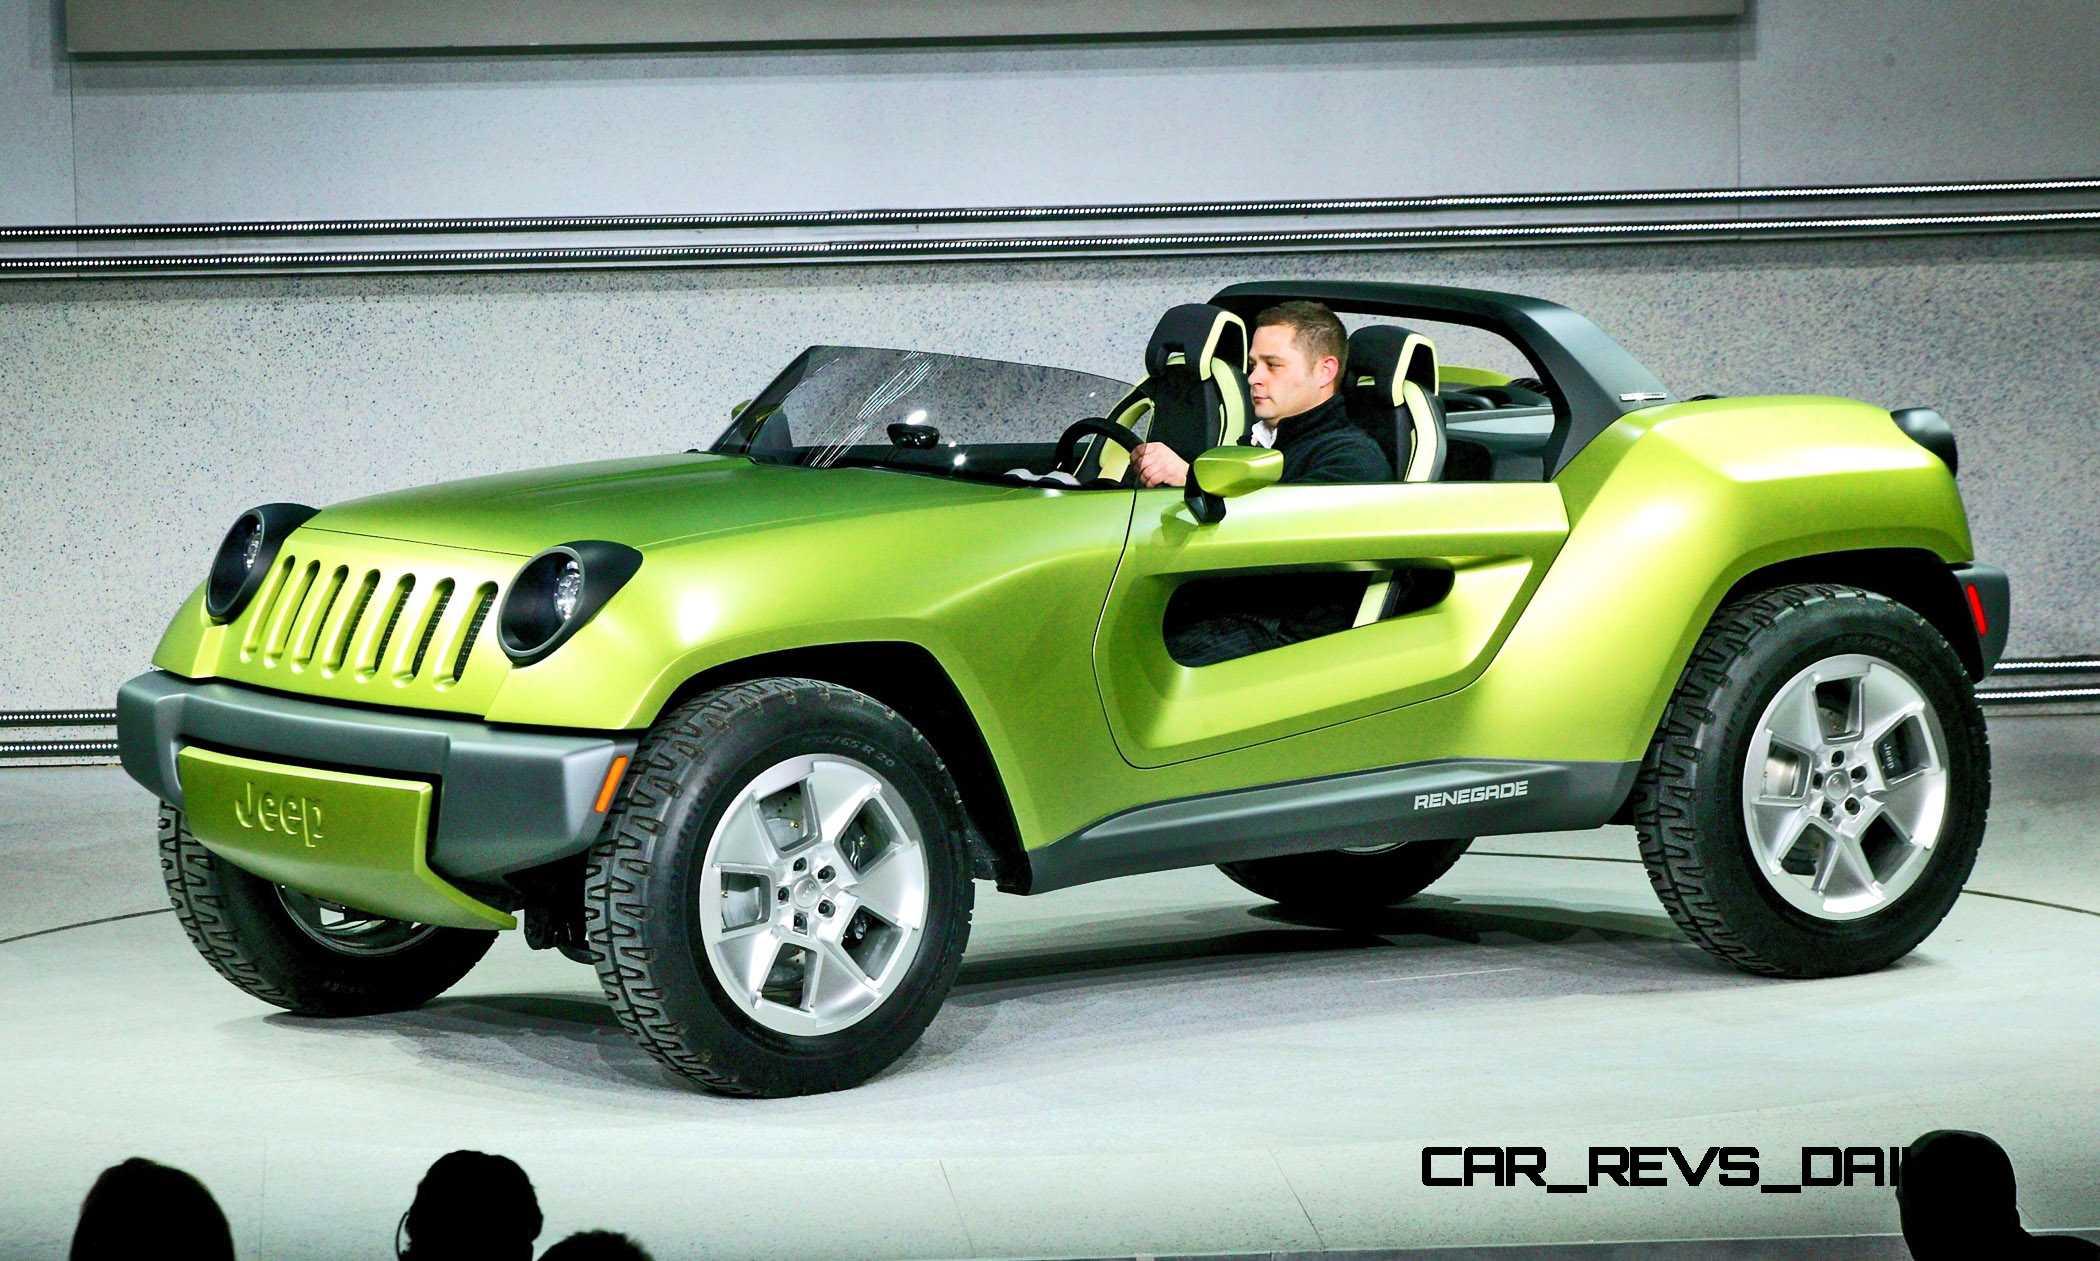 Jeep Renegade Concept Was Ev Off Road Speedster Copy on Jeep Wrangler Renegade Concept